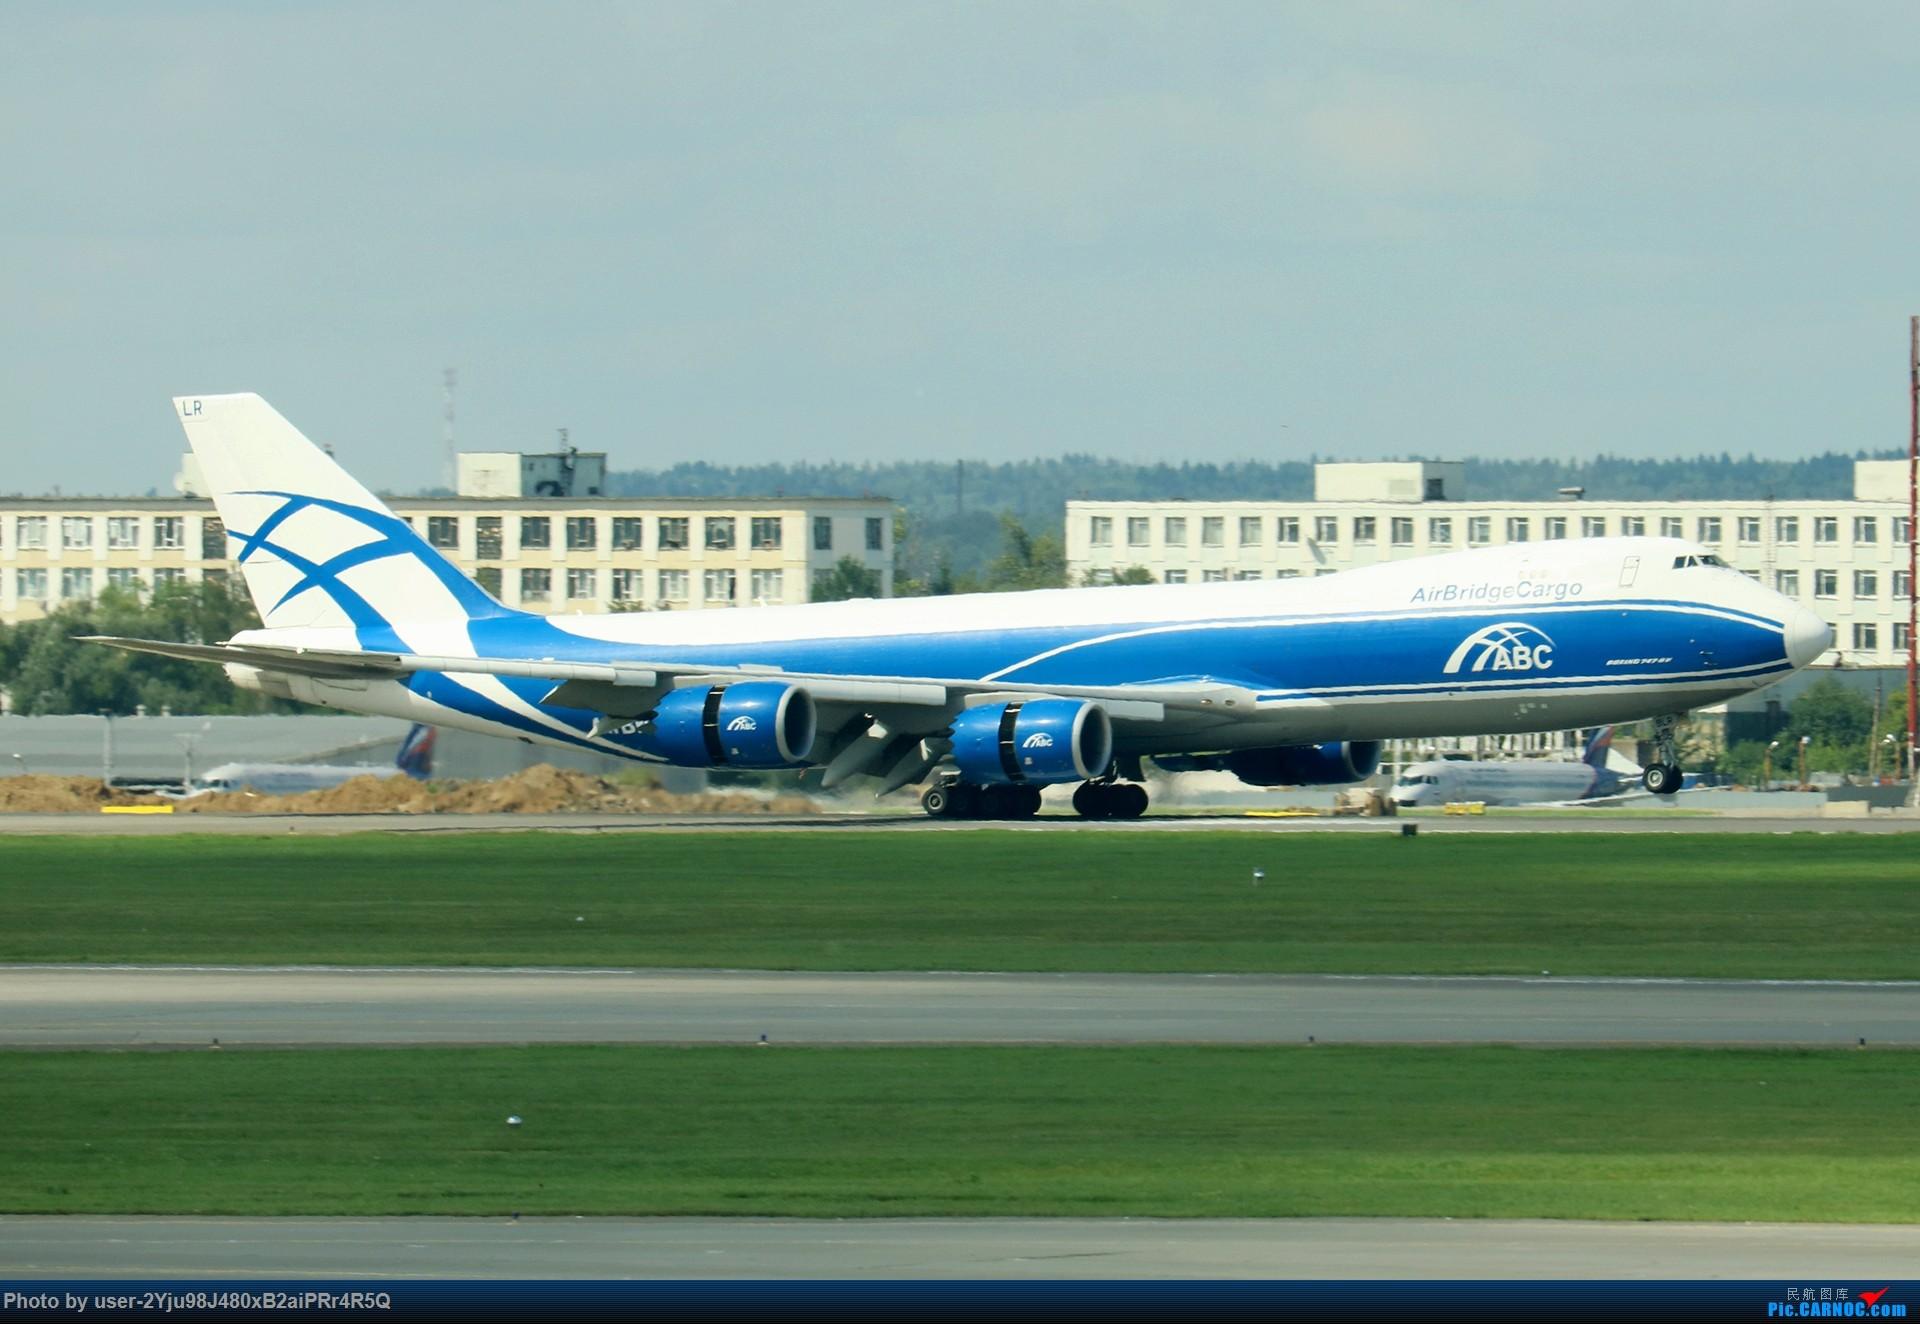 Re:[原创]LIULIU|Sheremetyevo的漫游|俄罗斯空桥货运 BOEING 747-8F VQ-BLR 俄罗斯谢诺梅杰沃机场